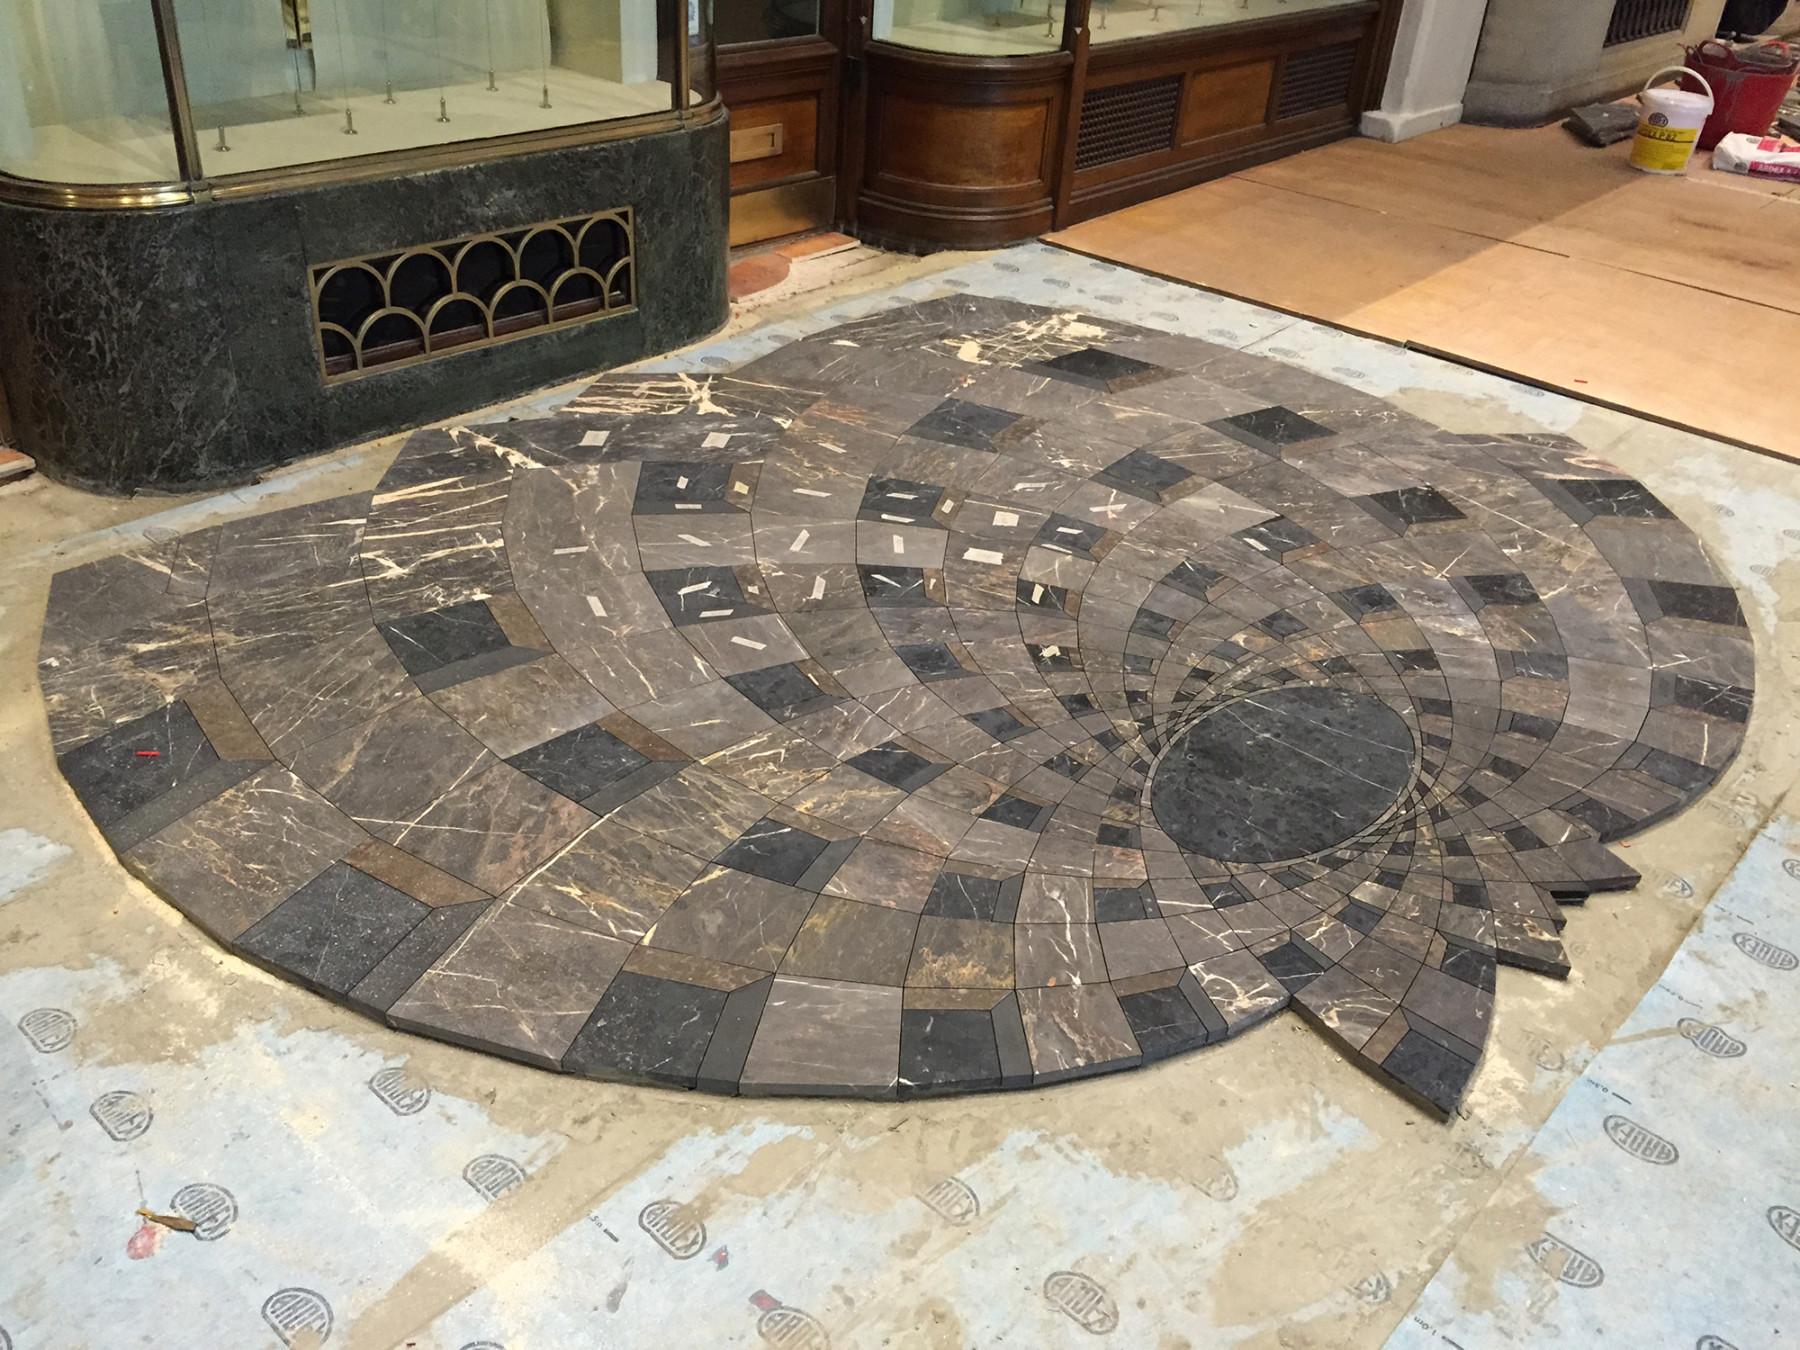 Burlington-Arcade-Piccadilly-London-Royal-Academy-Jamie-Fobert-Architects--British-stone-floor-marble-on-site-3